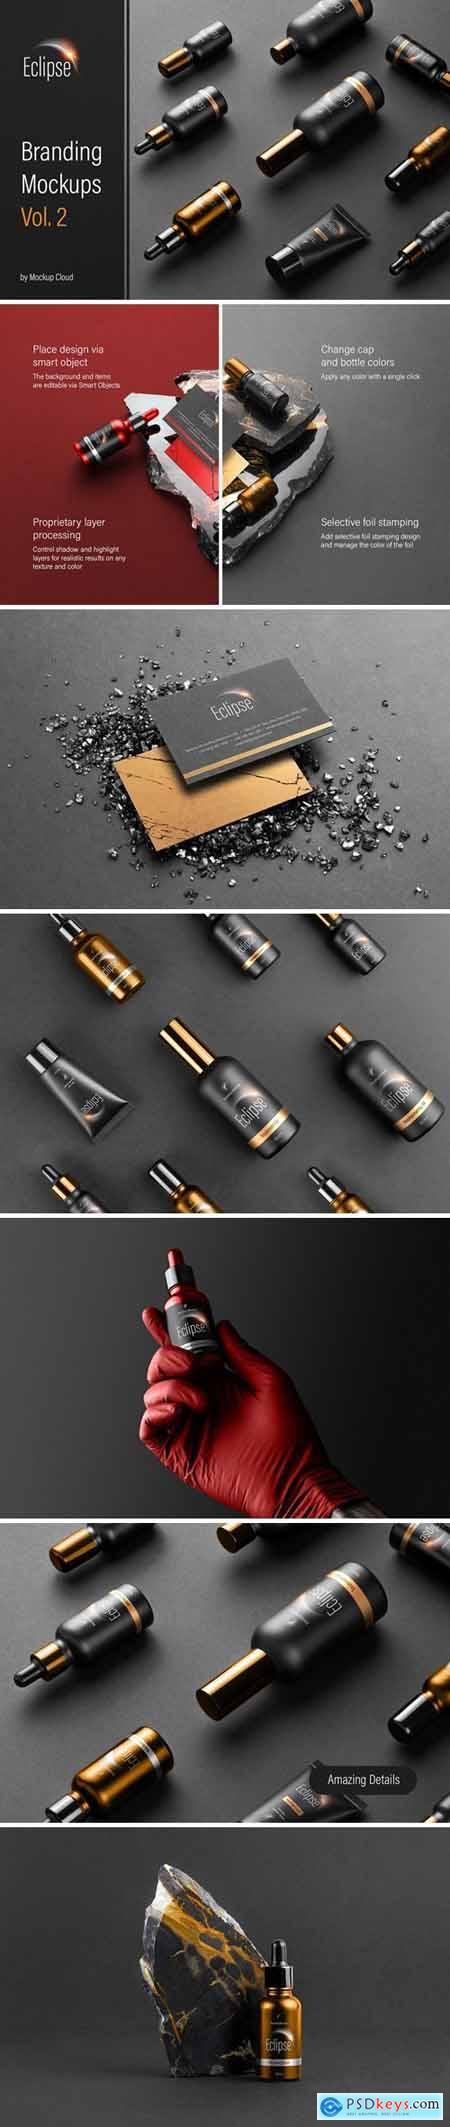 Eclipse – Cosmetics Branding Mockups Vol2